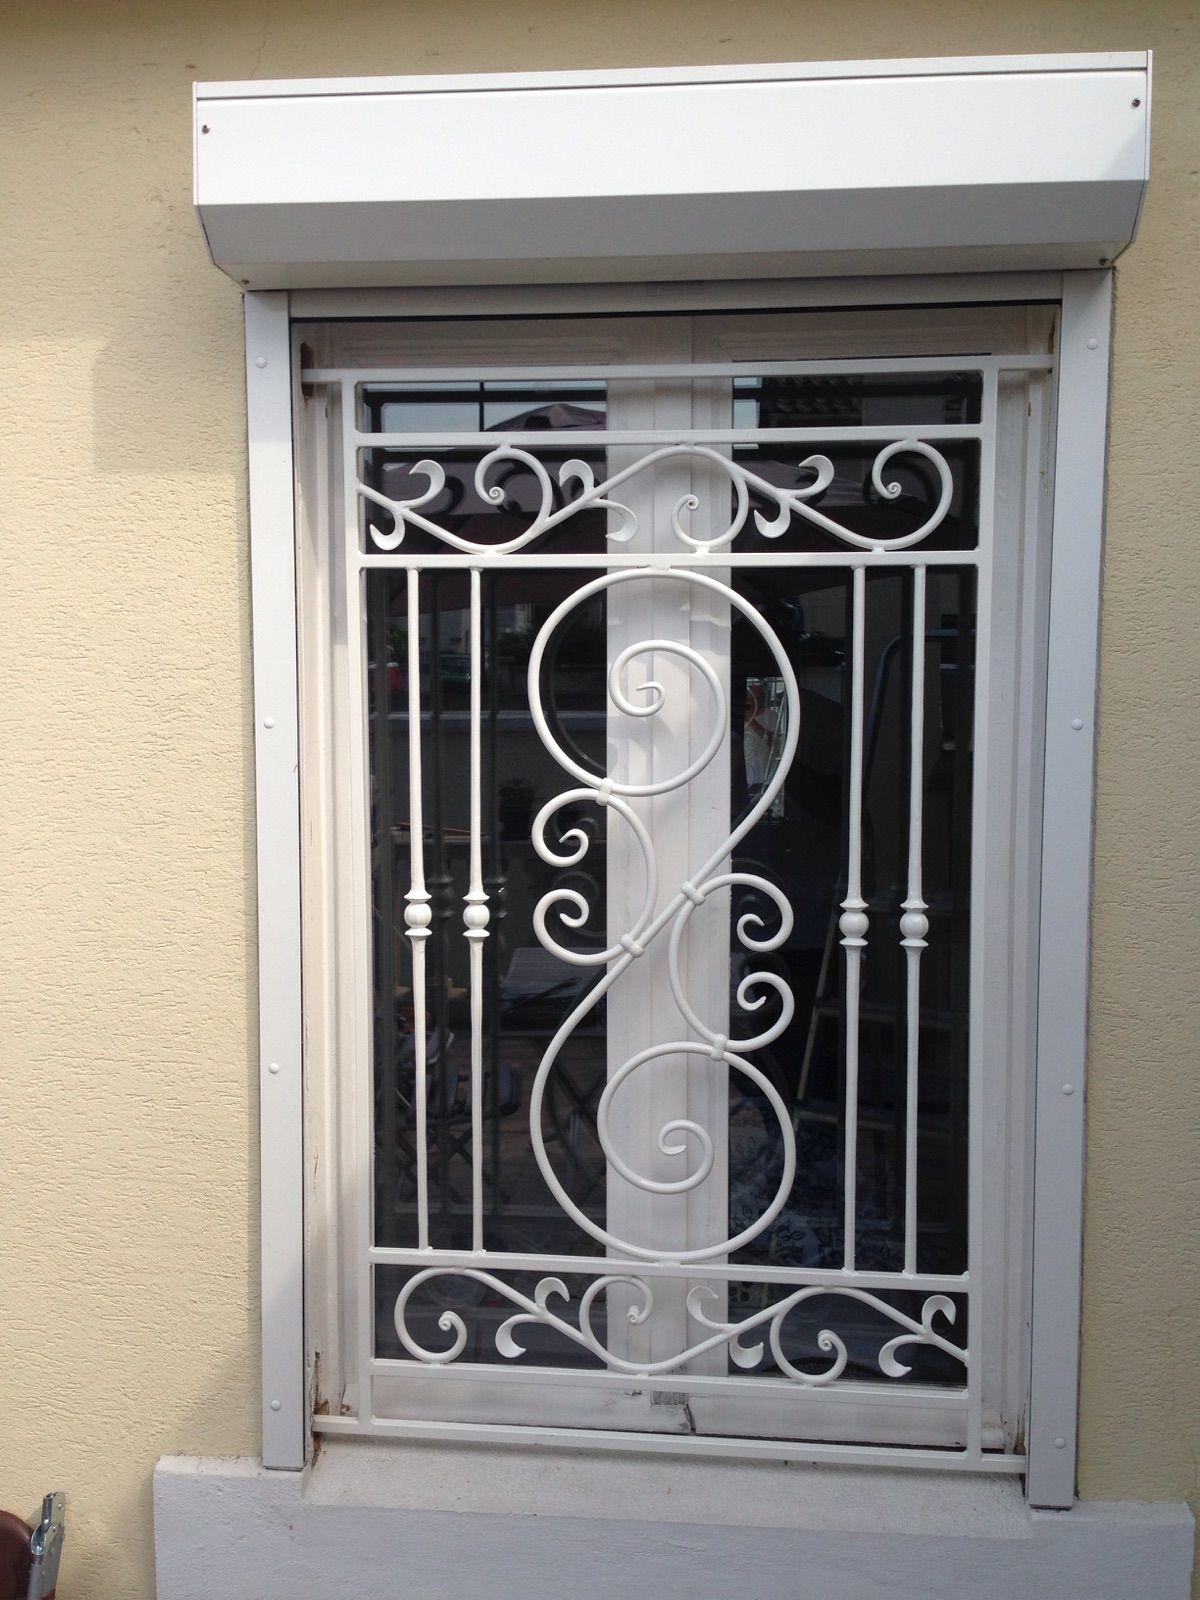 Window grill design door frames panels curtains iron doors gates burglar bars staircase also classical metal art rh pinterest